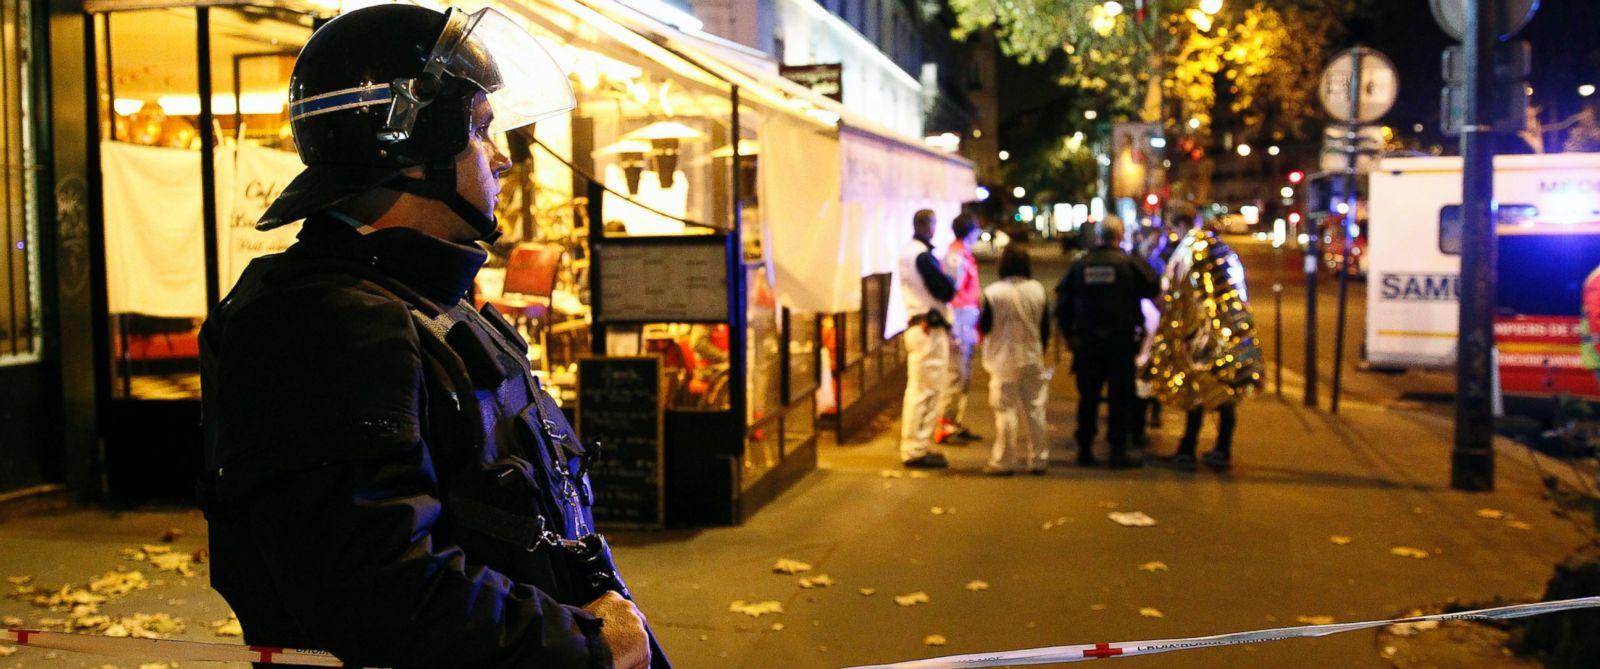 PHOTO: A policeman stands guard near the Boulevard des Filles-du-Calvaire after an attack, Nov, 13, 2015 in Paris.